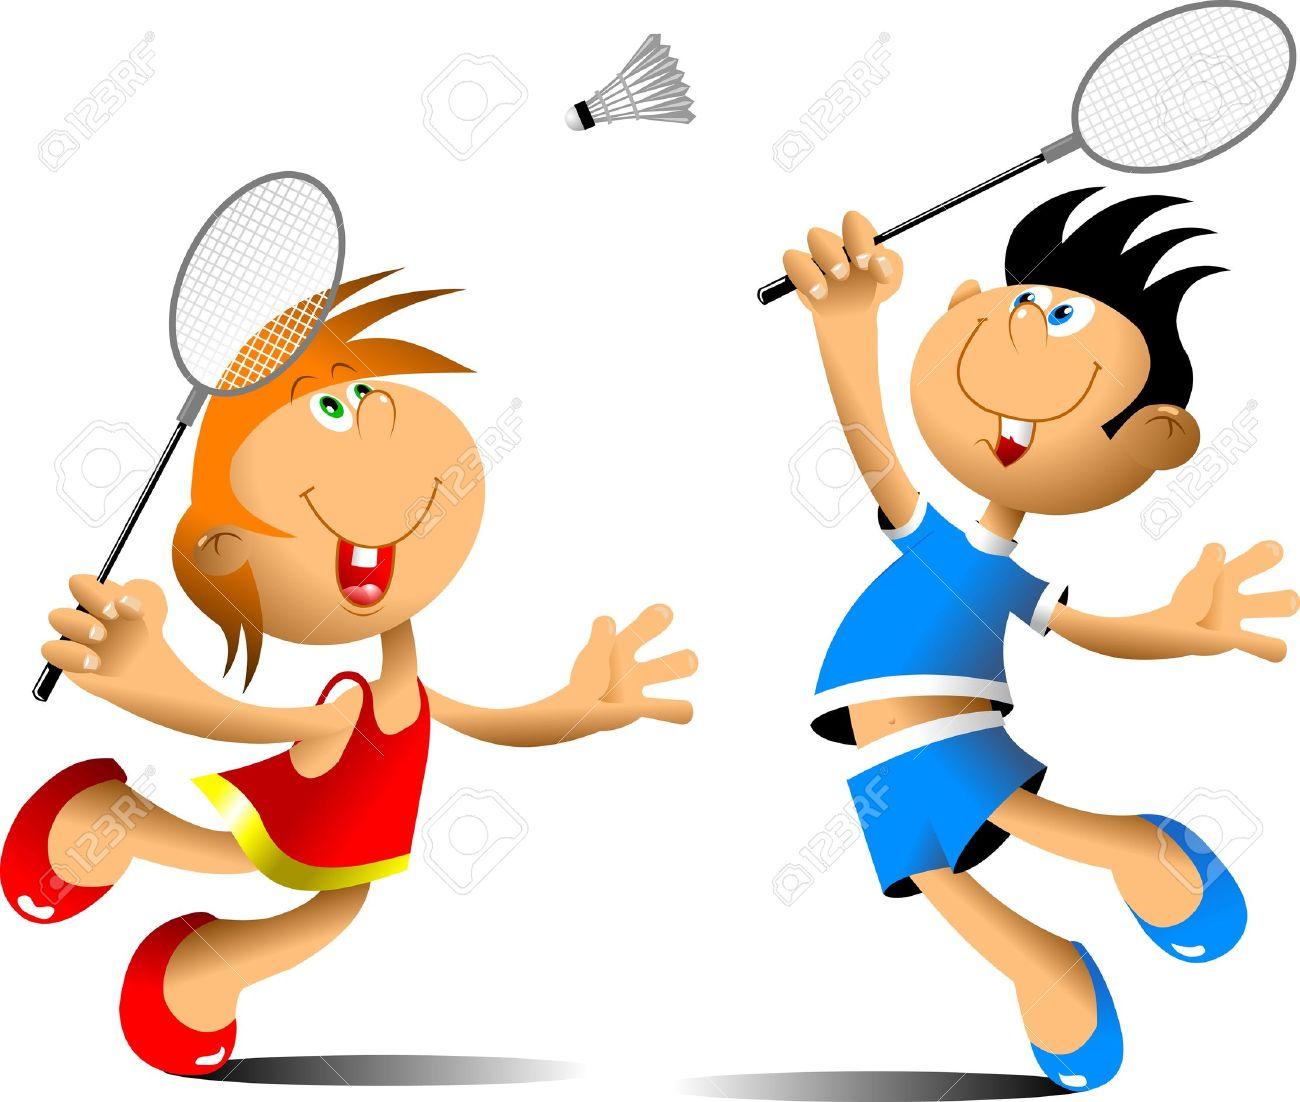 Play badminton clipart.